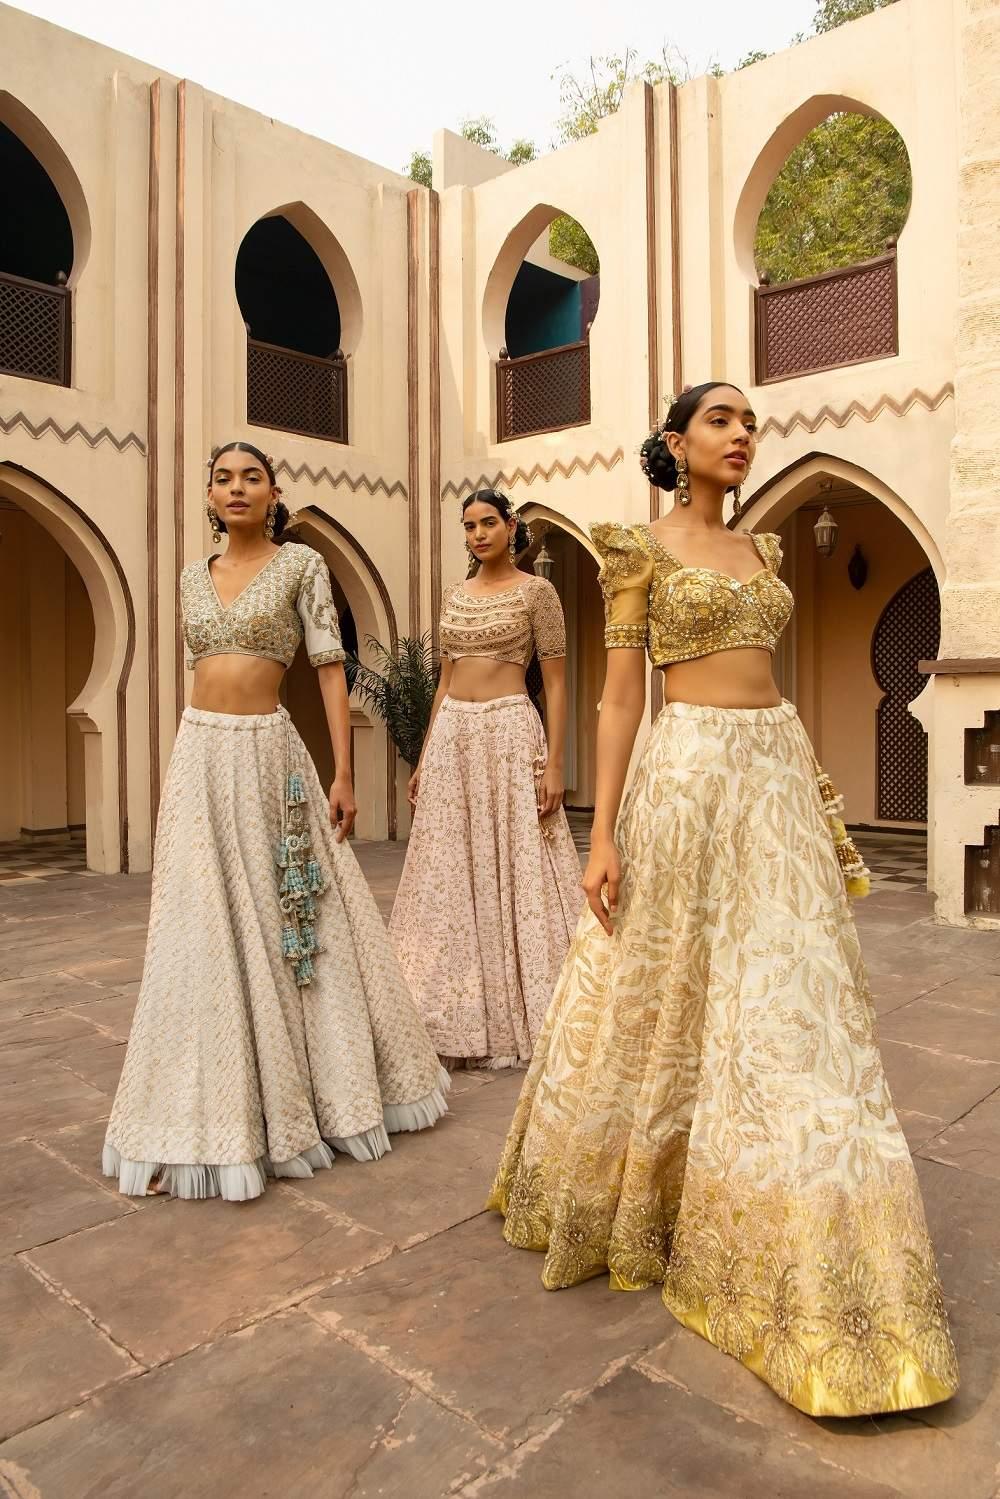 Kaaisha's Mehfil collection